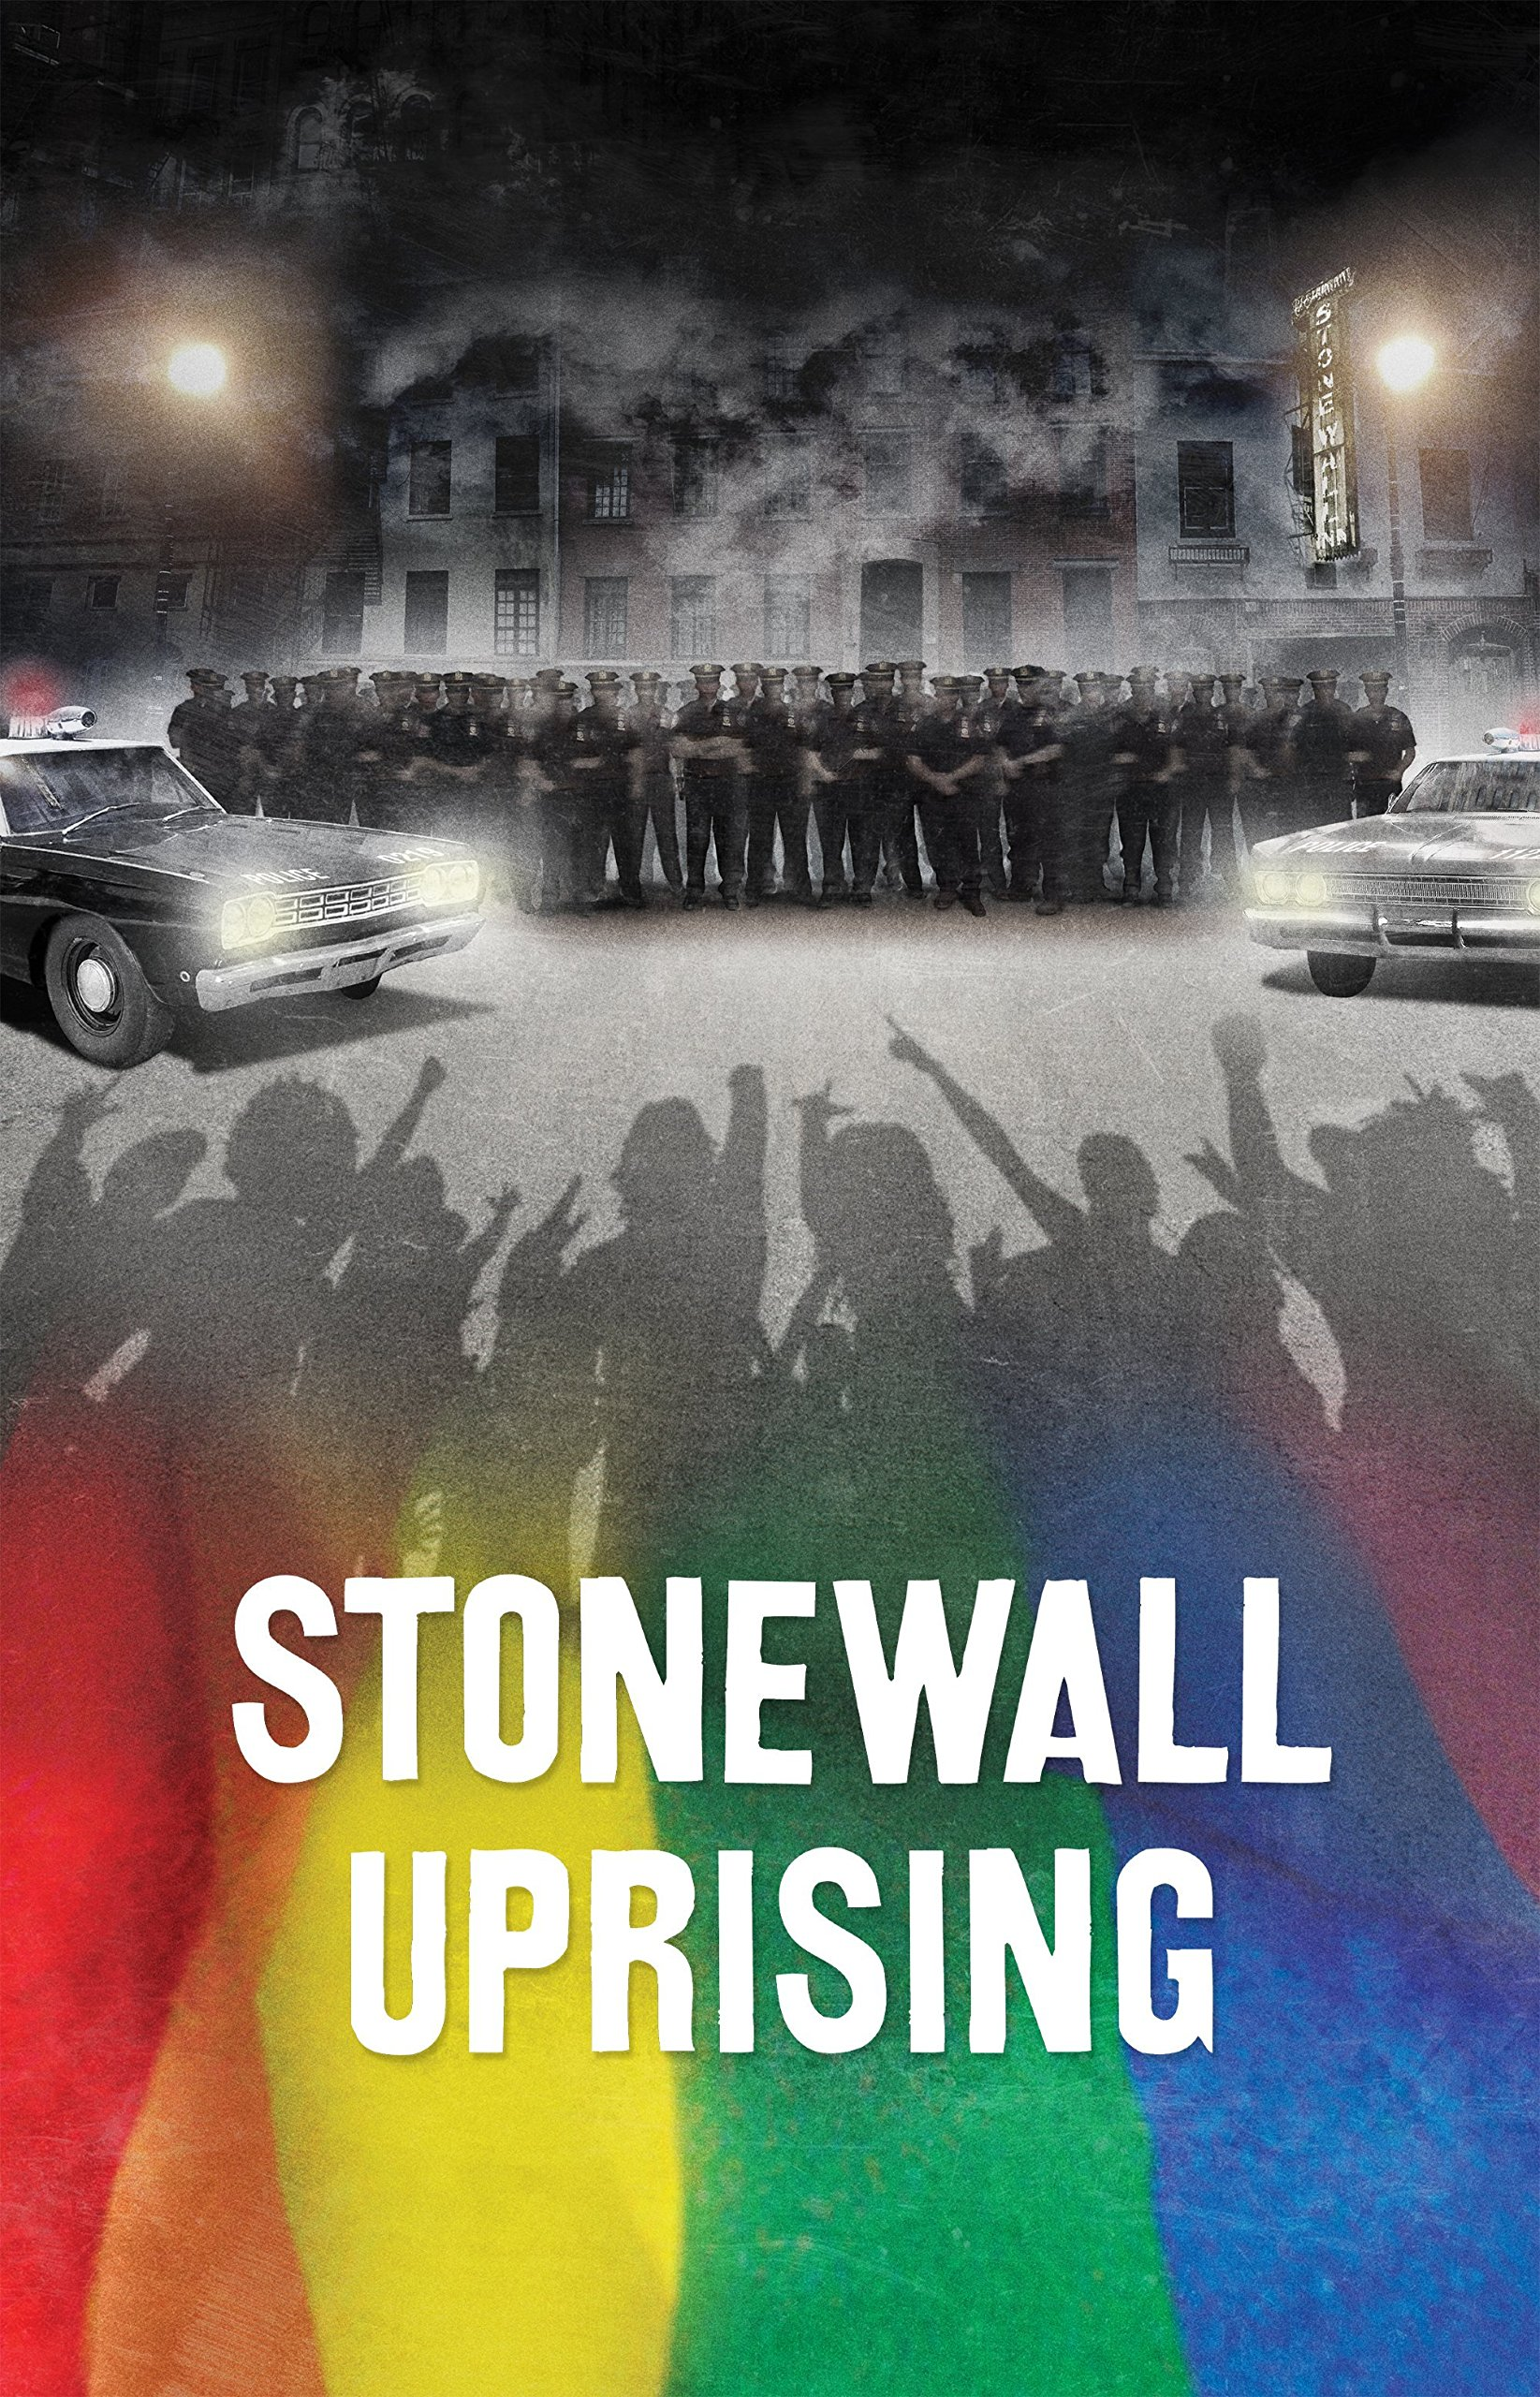 Stonewall Poster.jpg